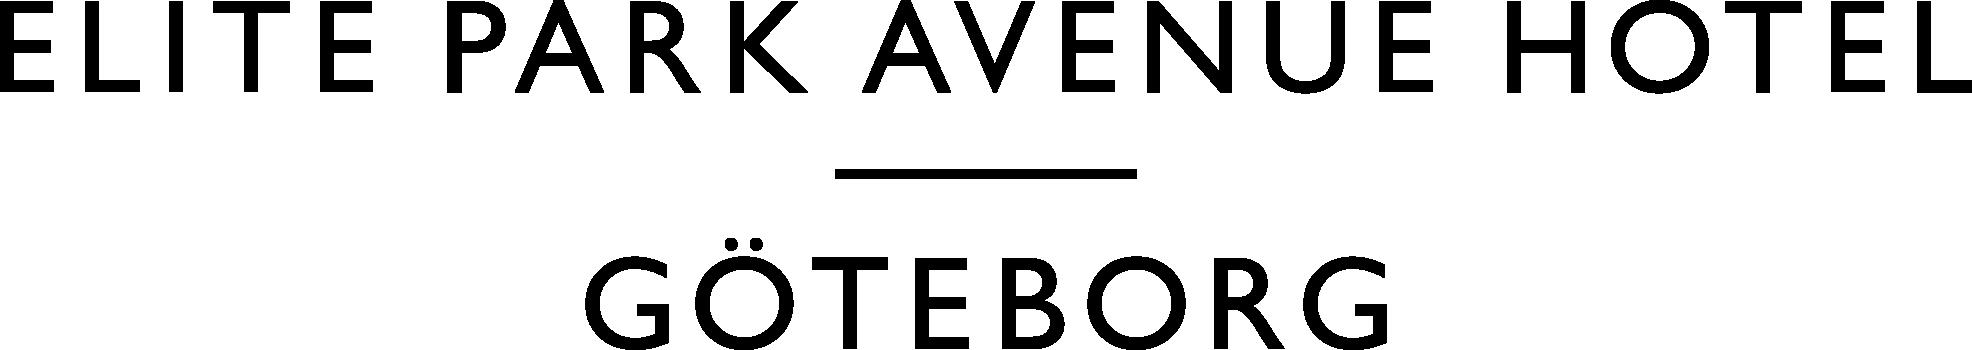 Göteborg - Elite Park Avenue Hotel logo 180208